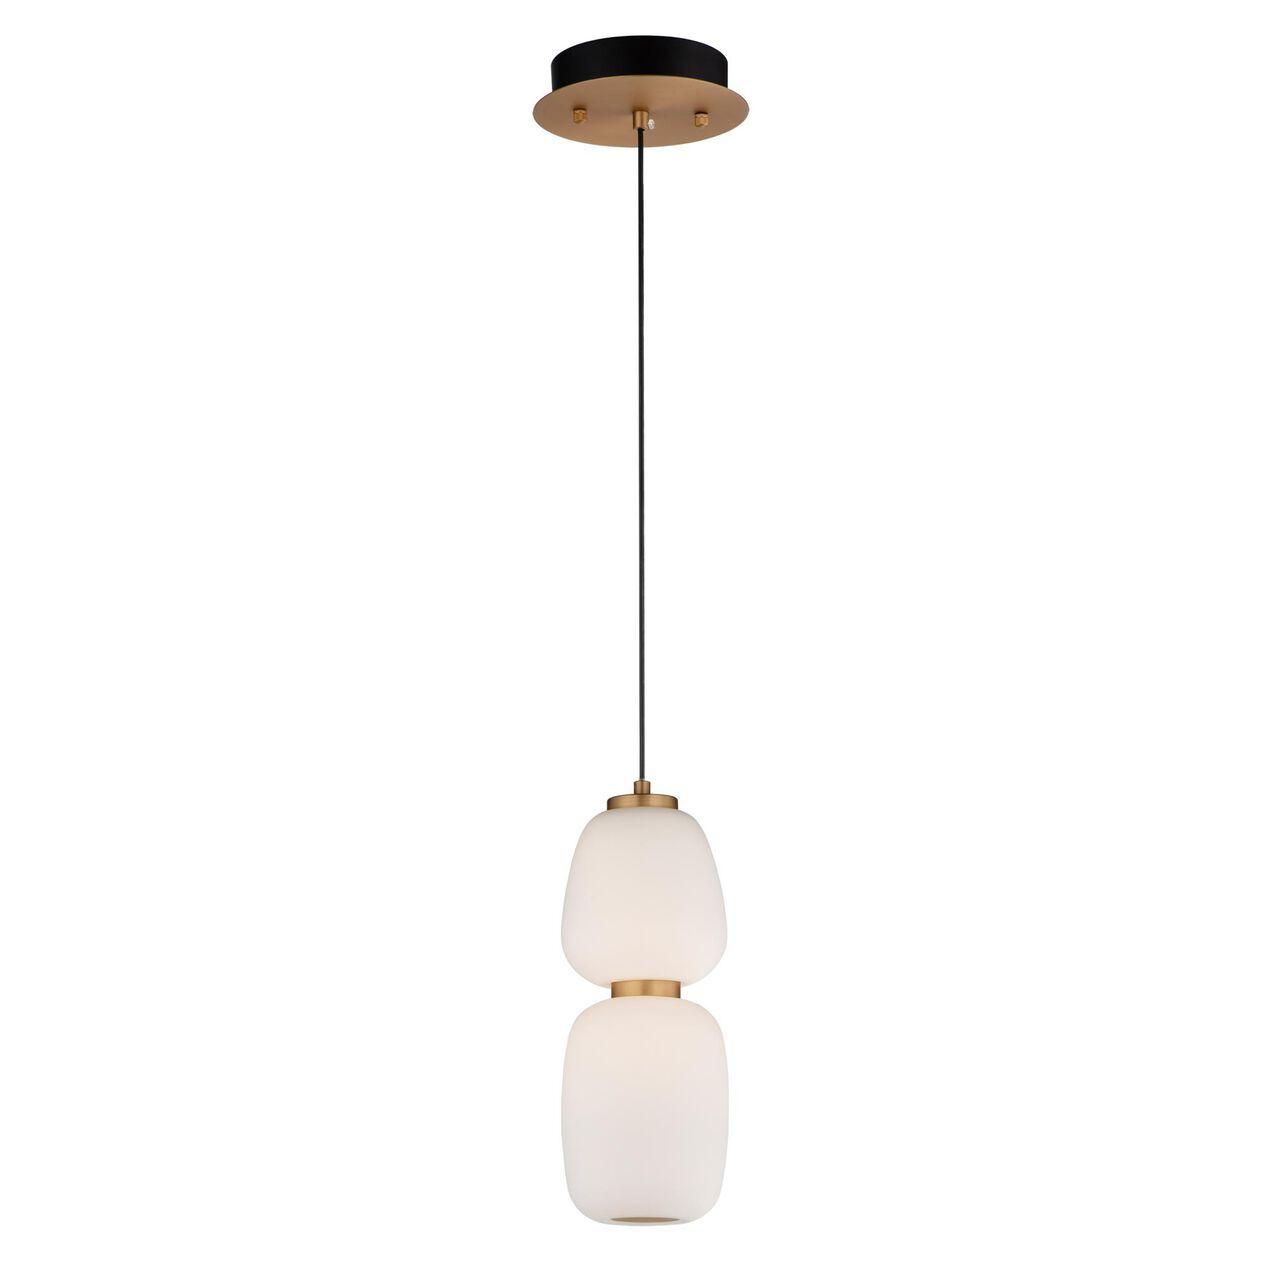 Soji 4 Inch Led Mini Pendant Capitol Lighting In 2021 White Glass Contemporary Pendant Lights Pendant Light Design